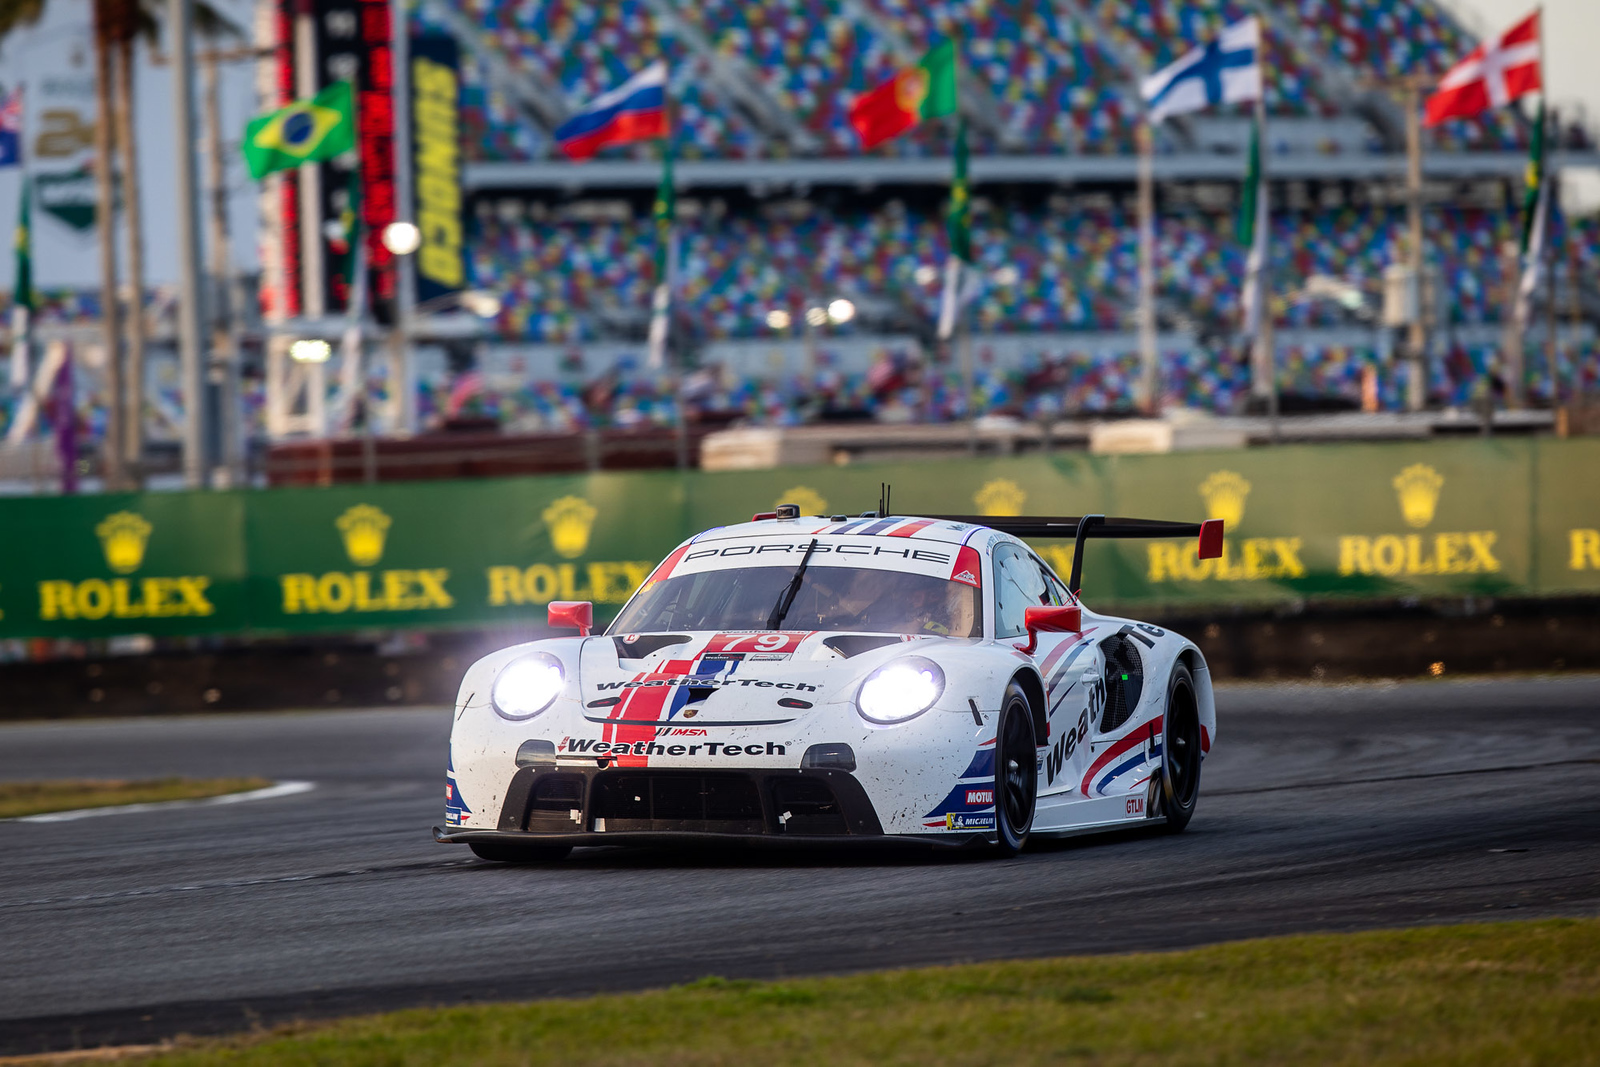 Porsche driving on track_